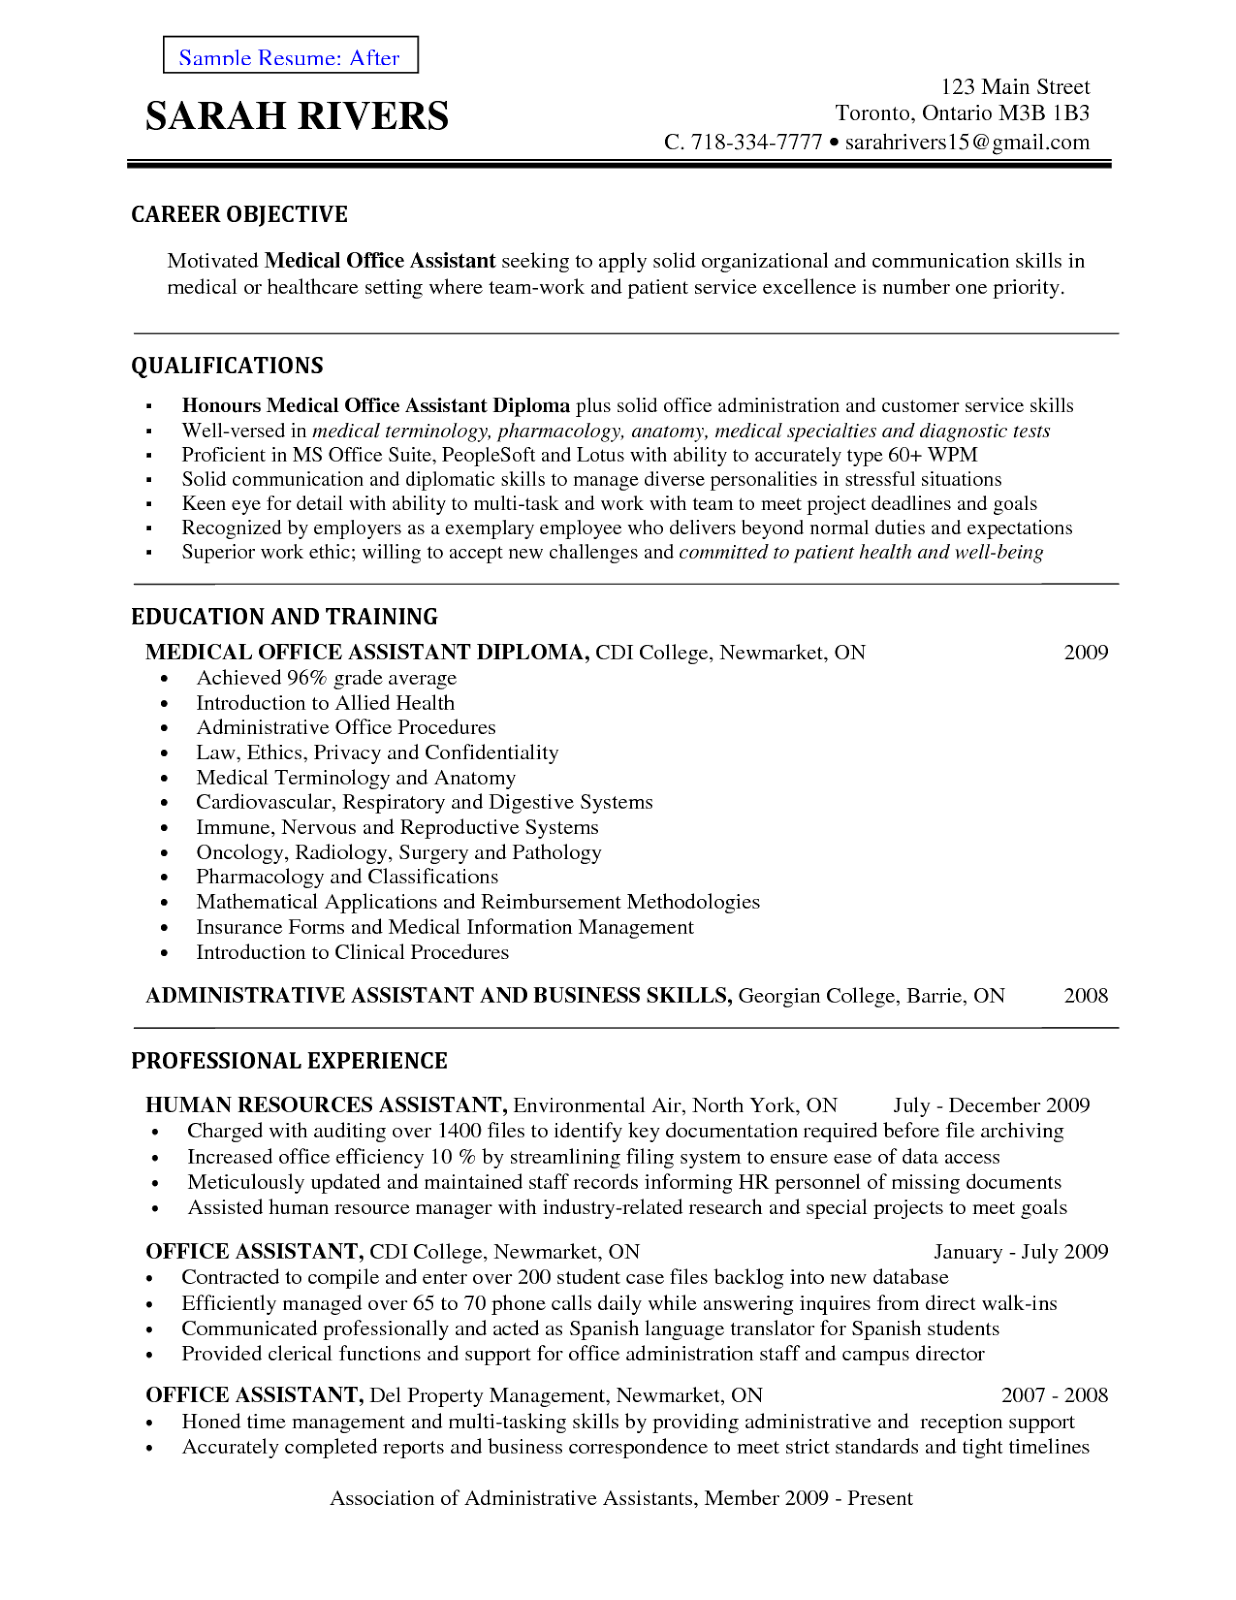 human resource essay human resources essay essay on human resource